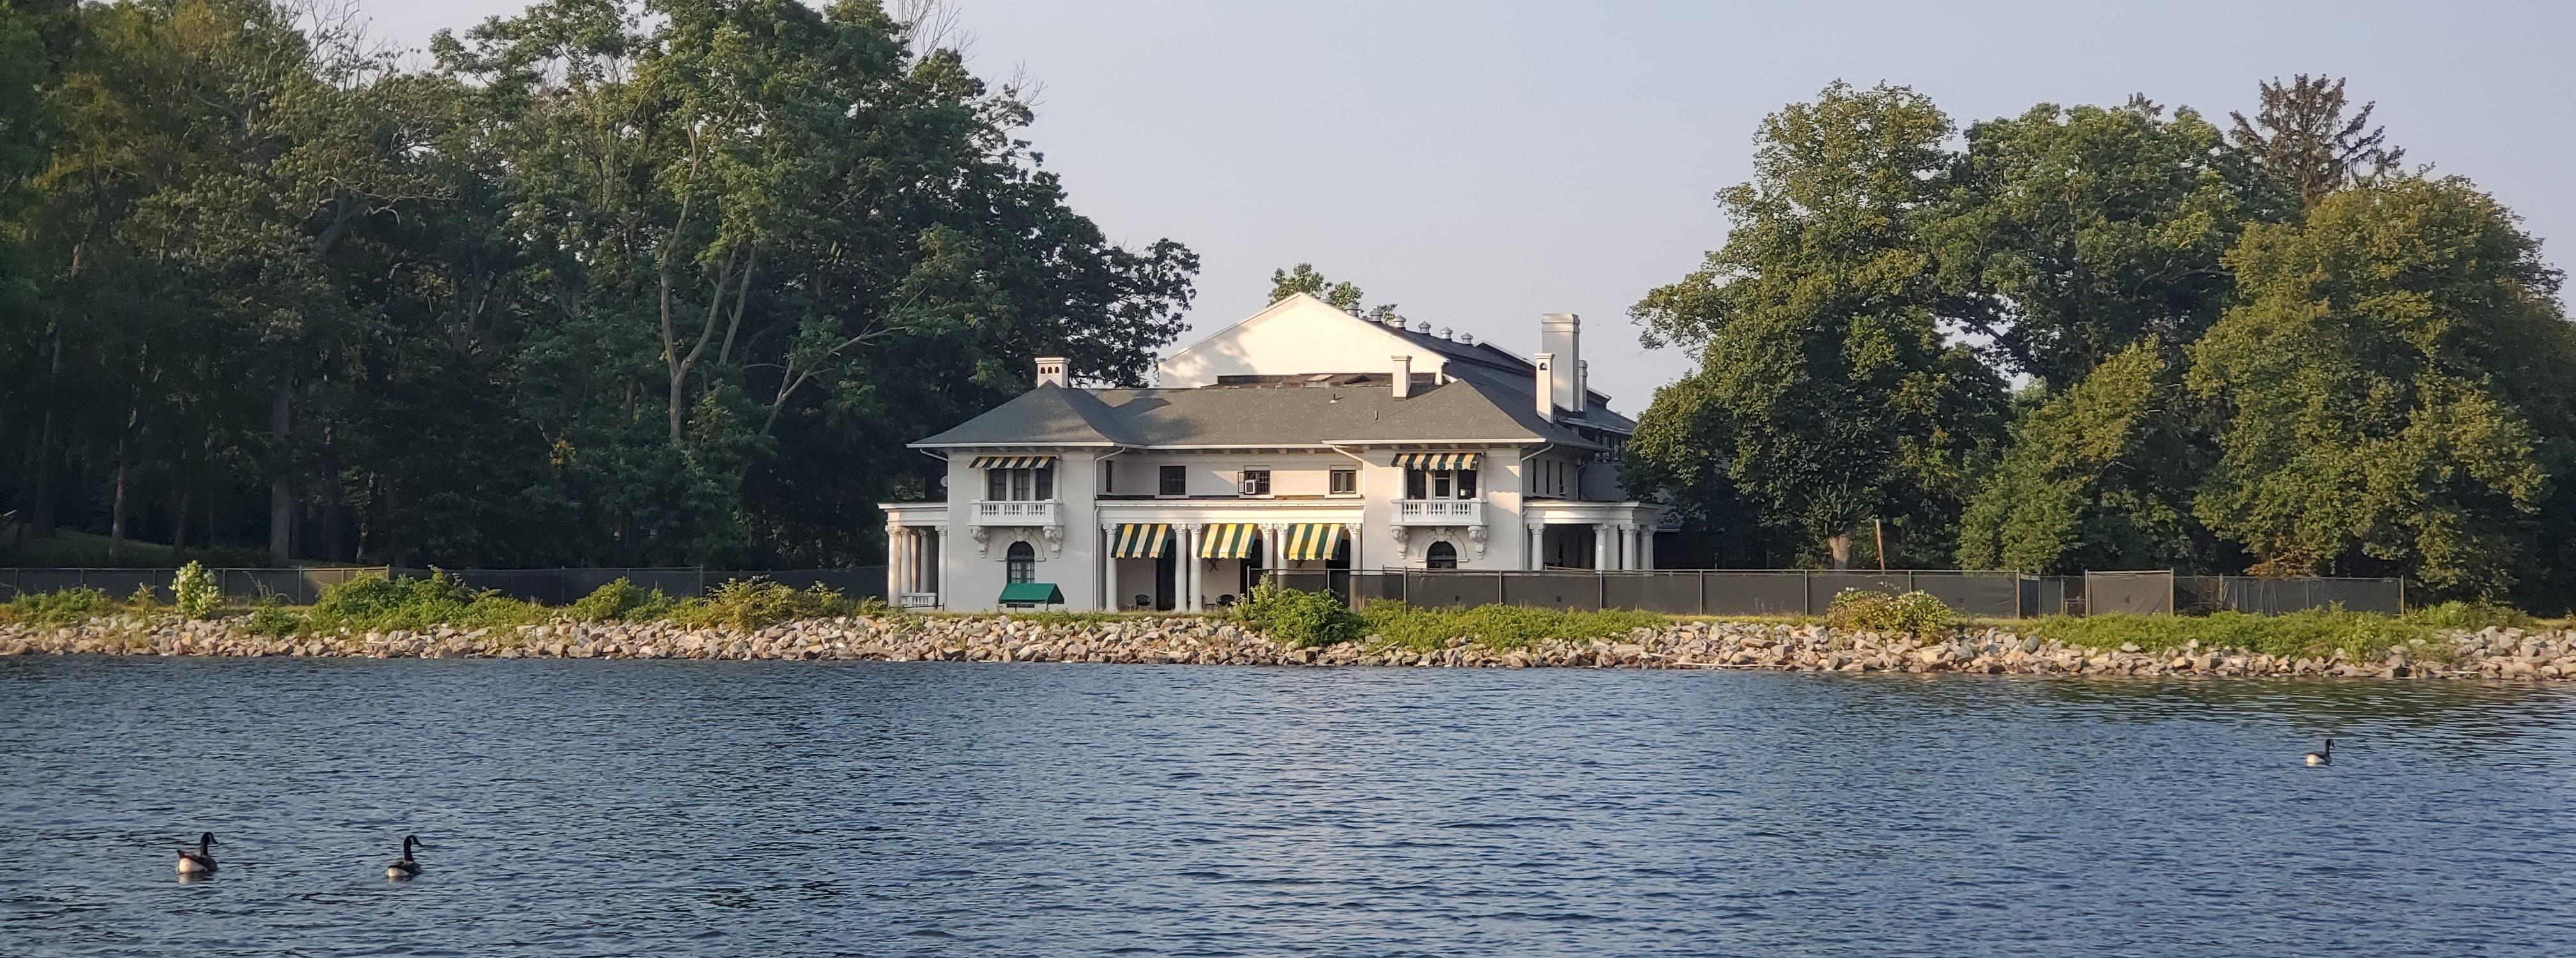 The Tuxedo Club Tennis House